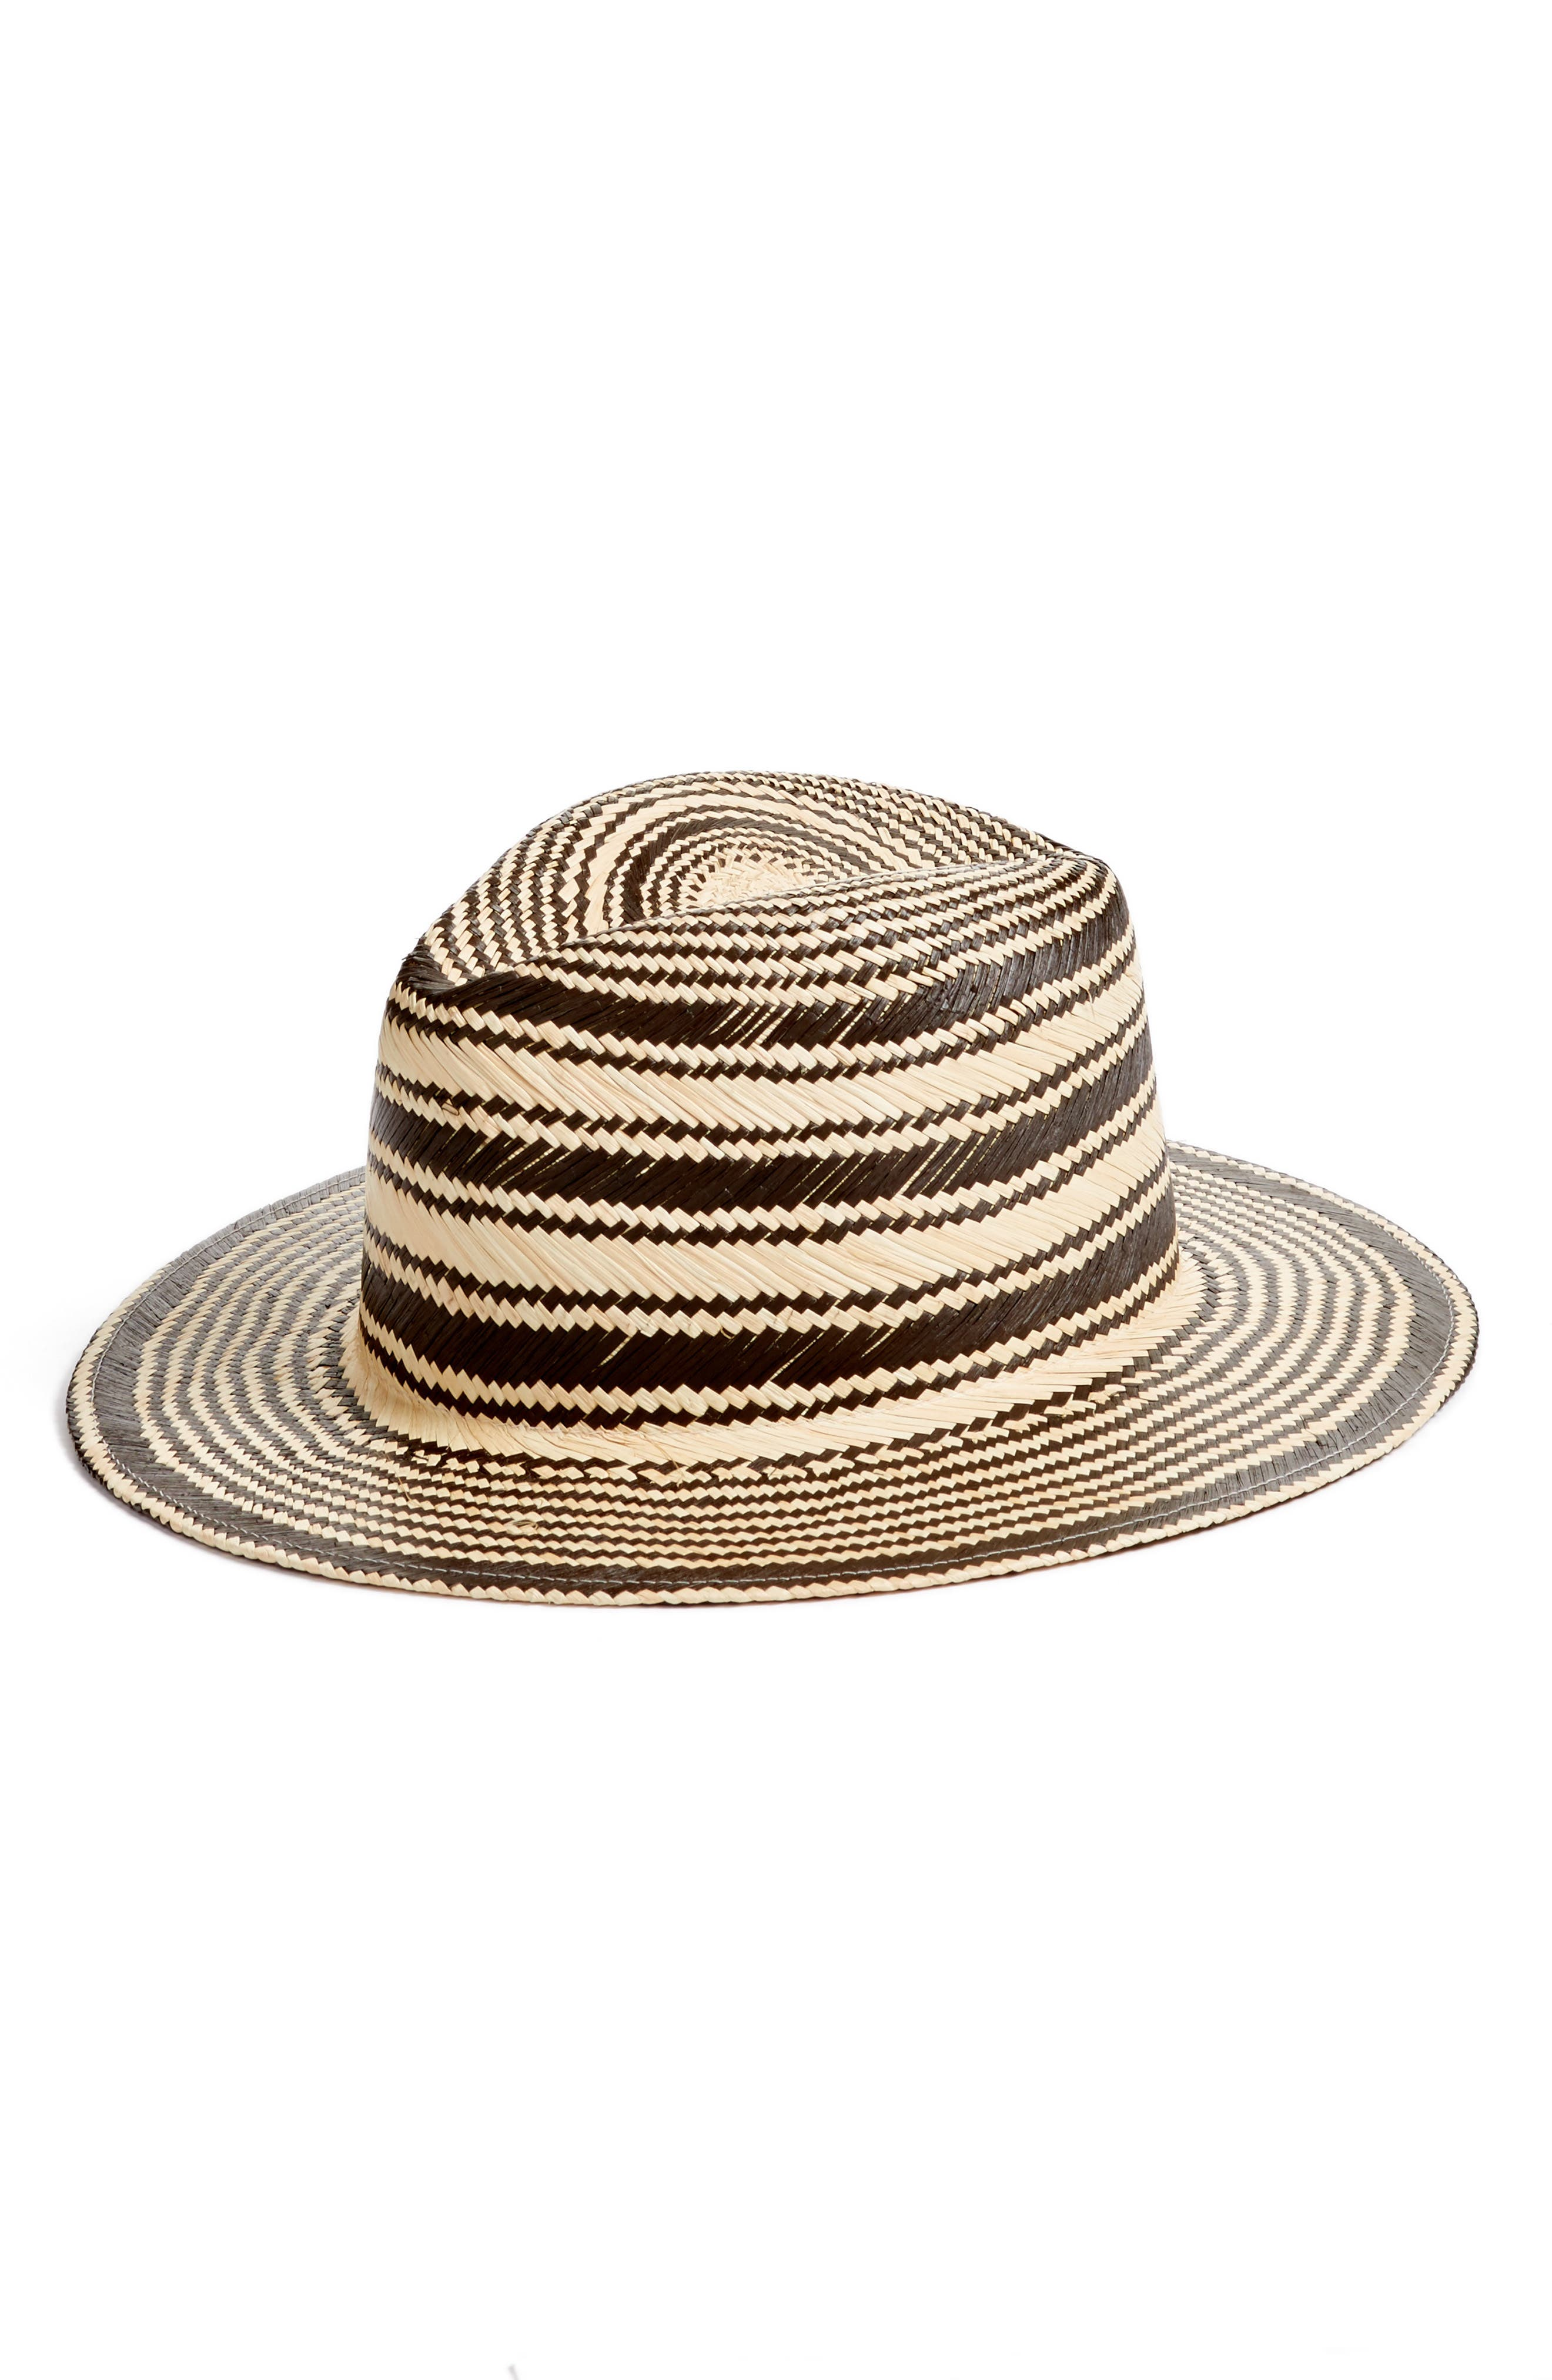 Stripe Panama Hat,                         Main,                         color, 001